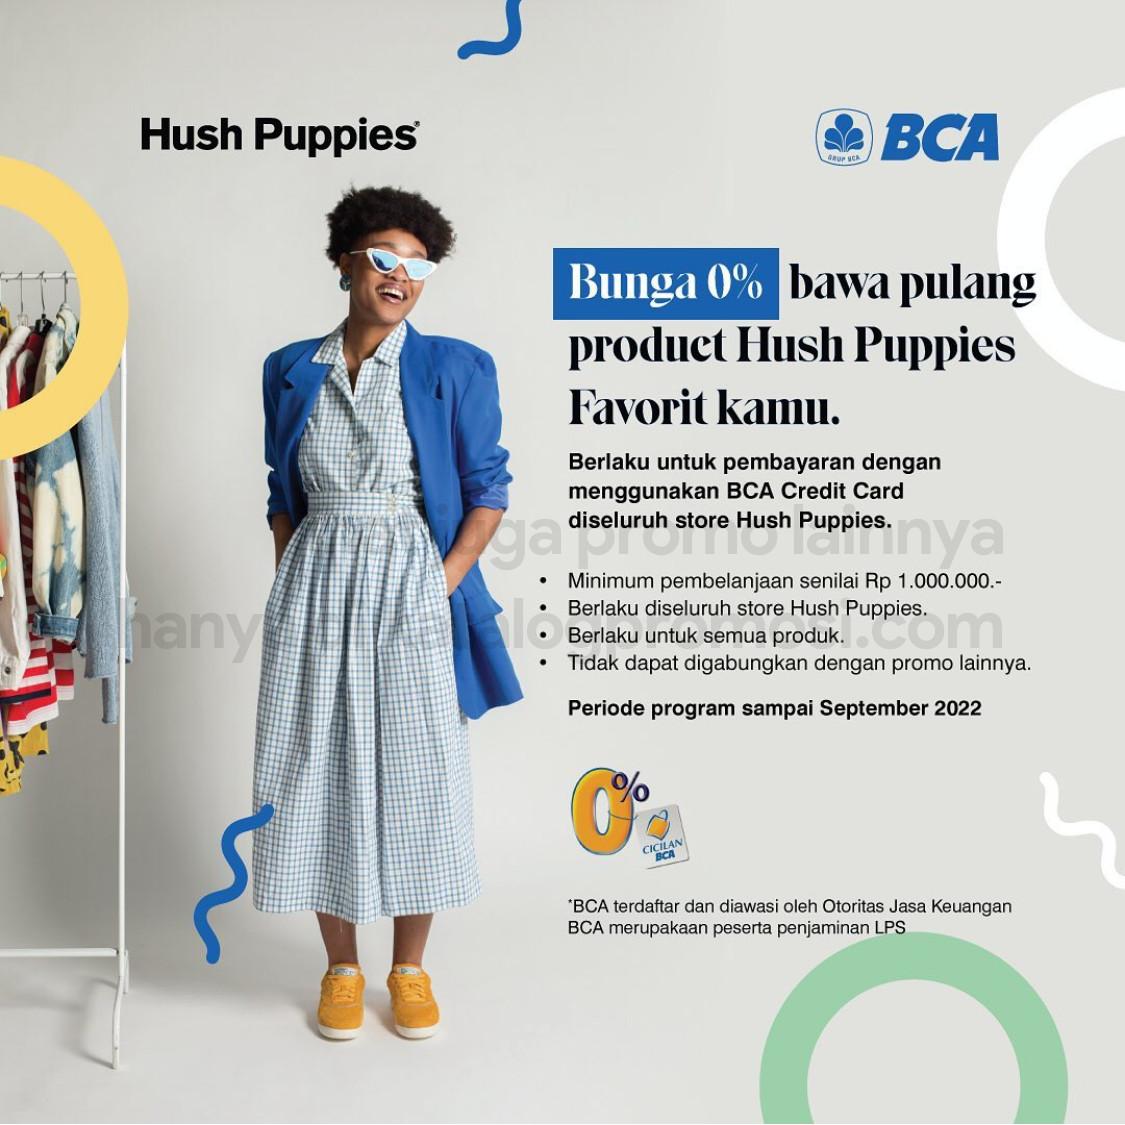 Promo HUSH PUPPIES CICILAN 0% hingga 6 bulan khusus transaksi dengan KARTU KREDIT BCA